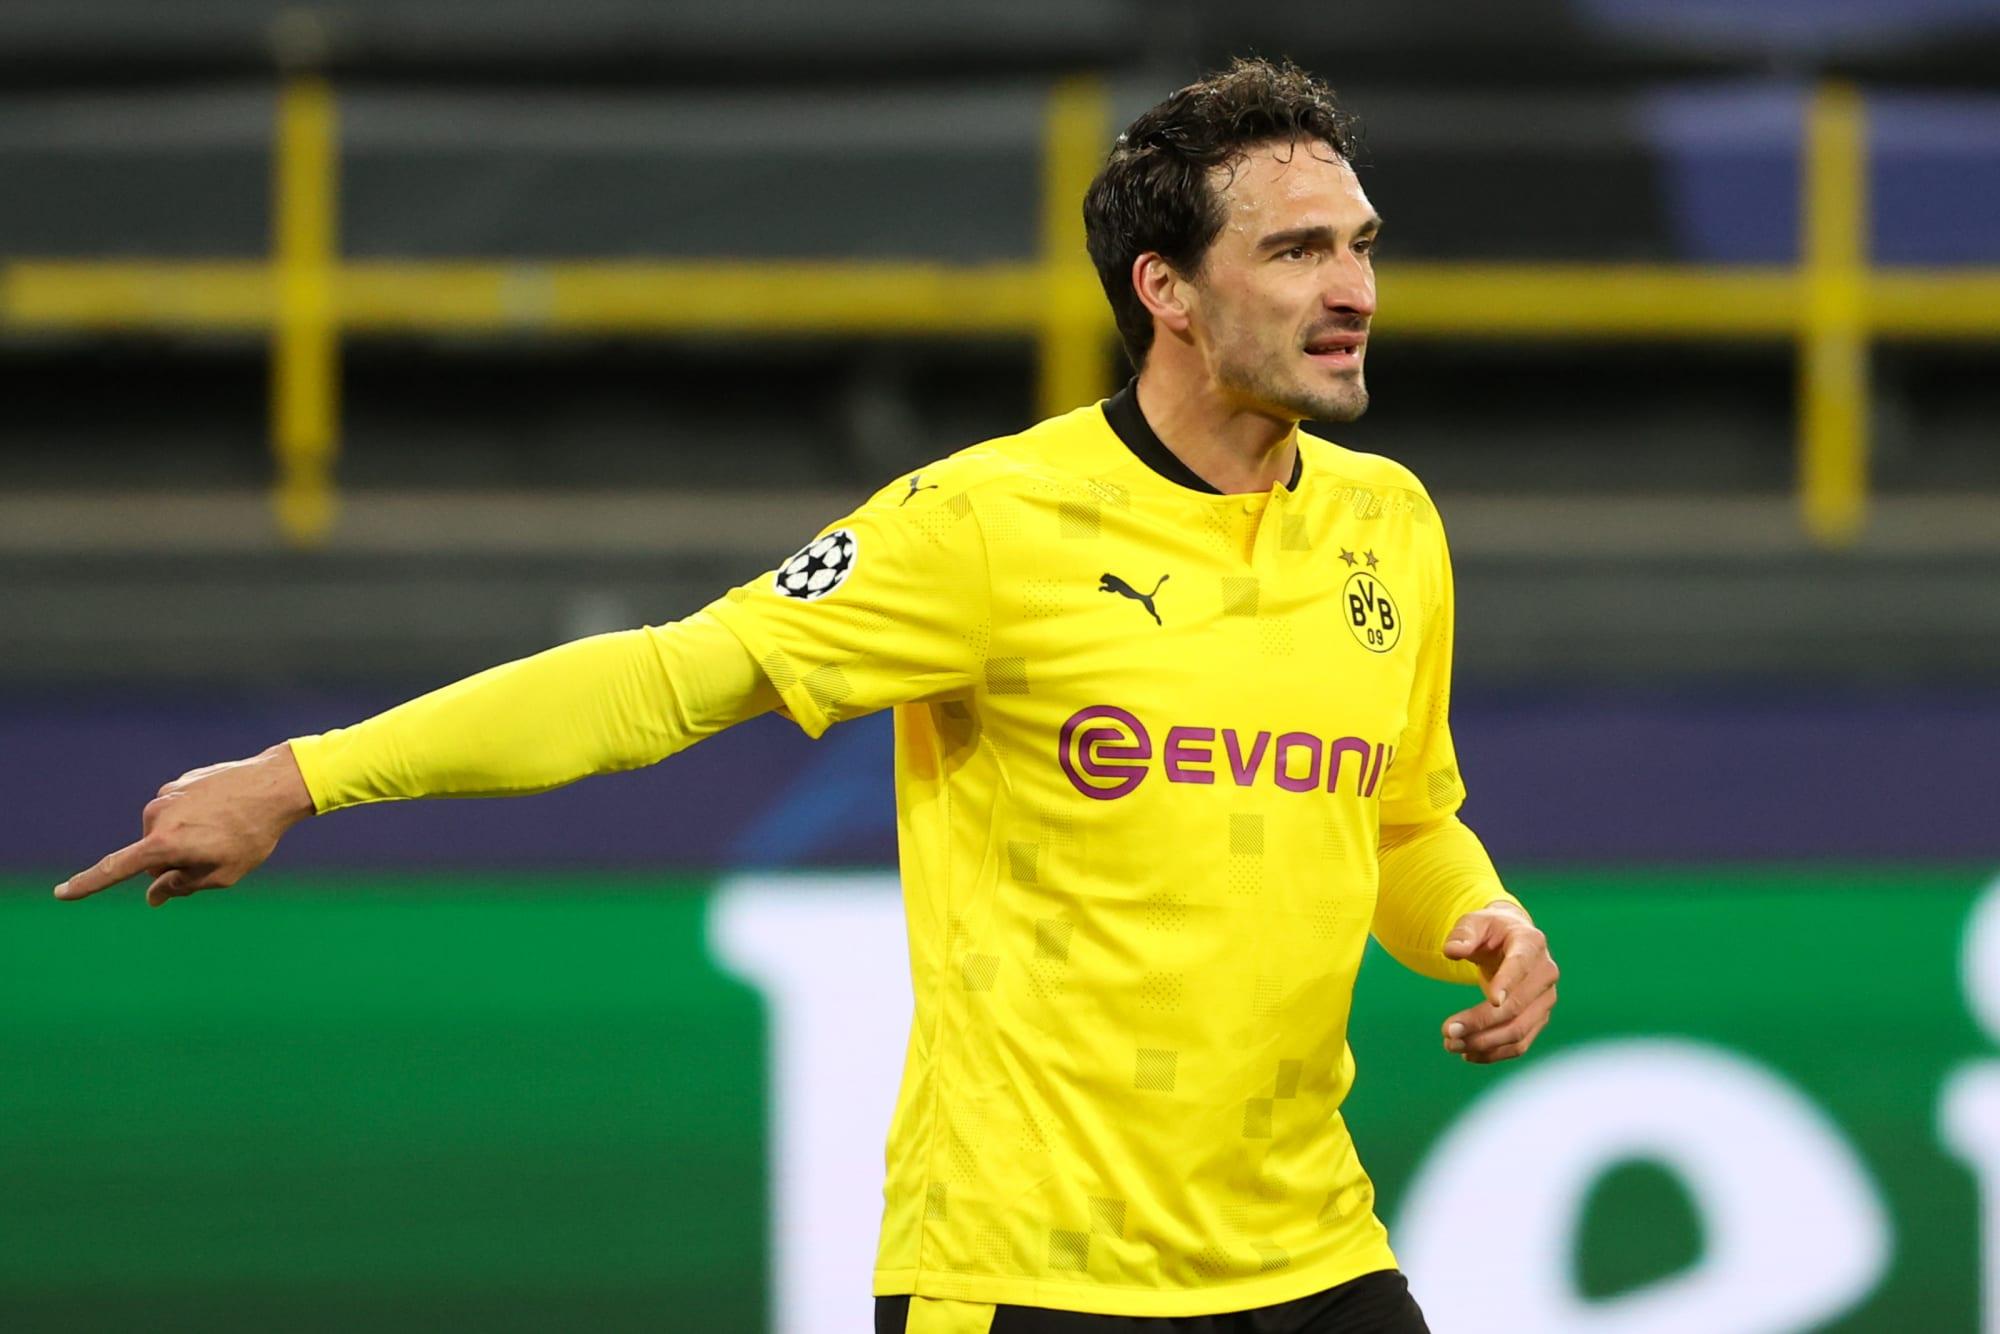 Borussia Dortmund face uncertainty over Mats Hummels injury